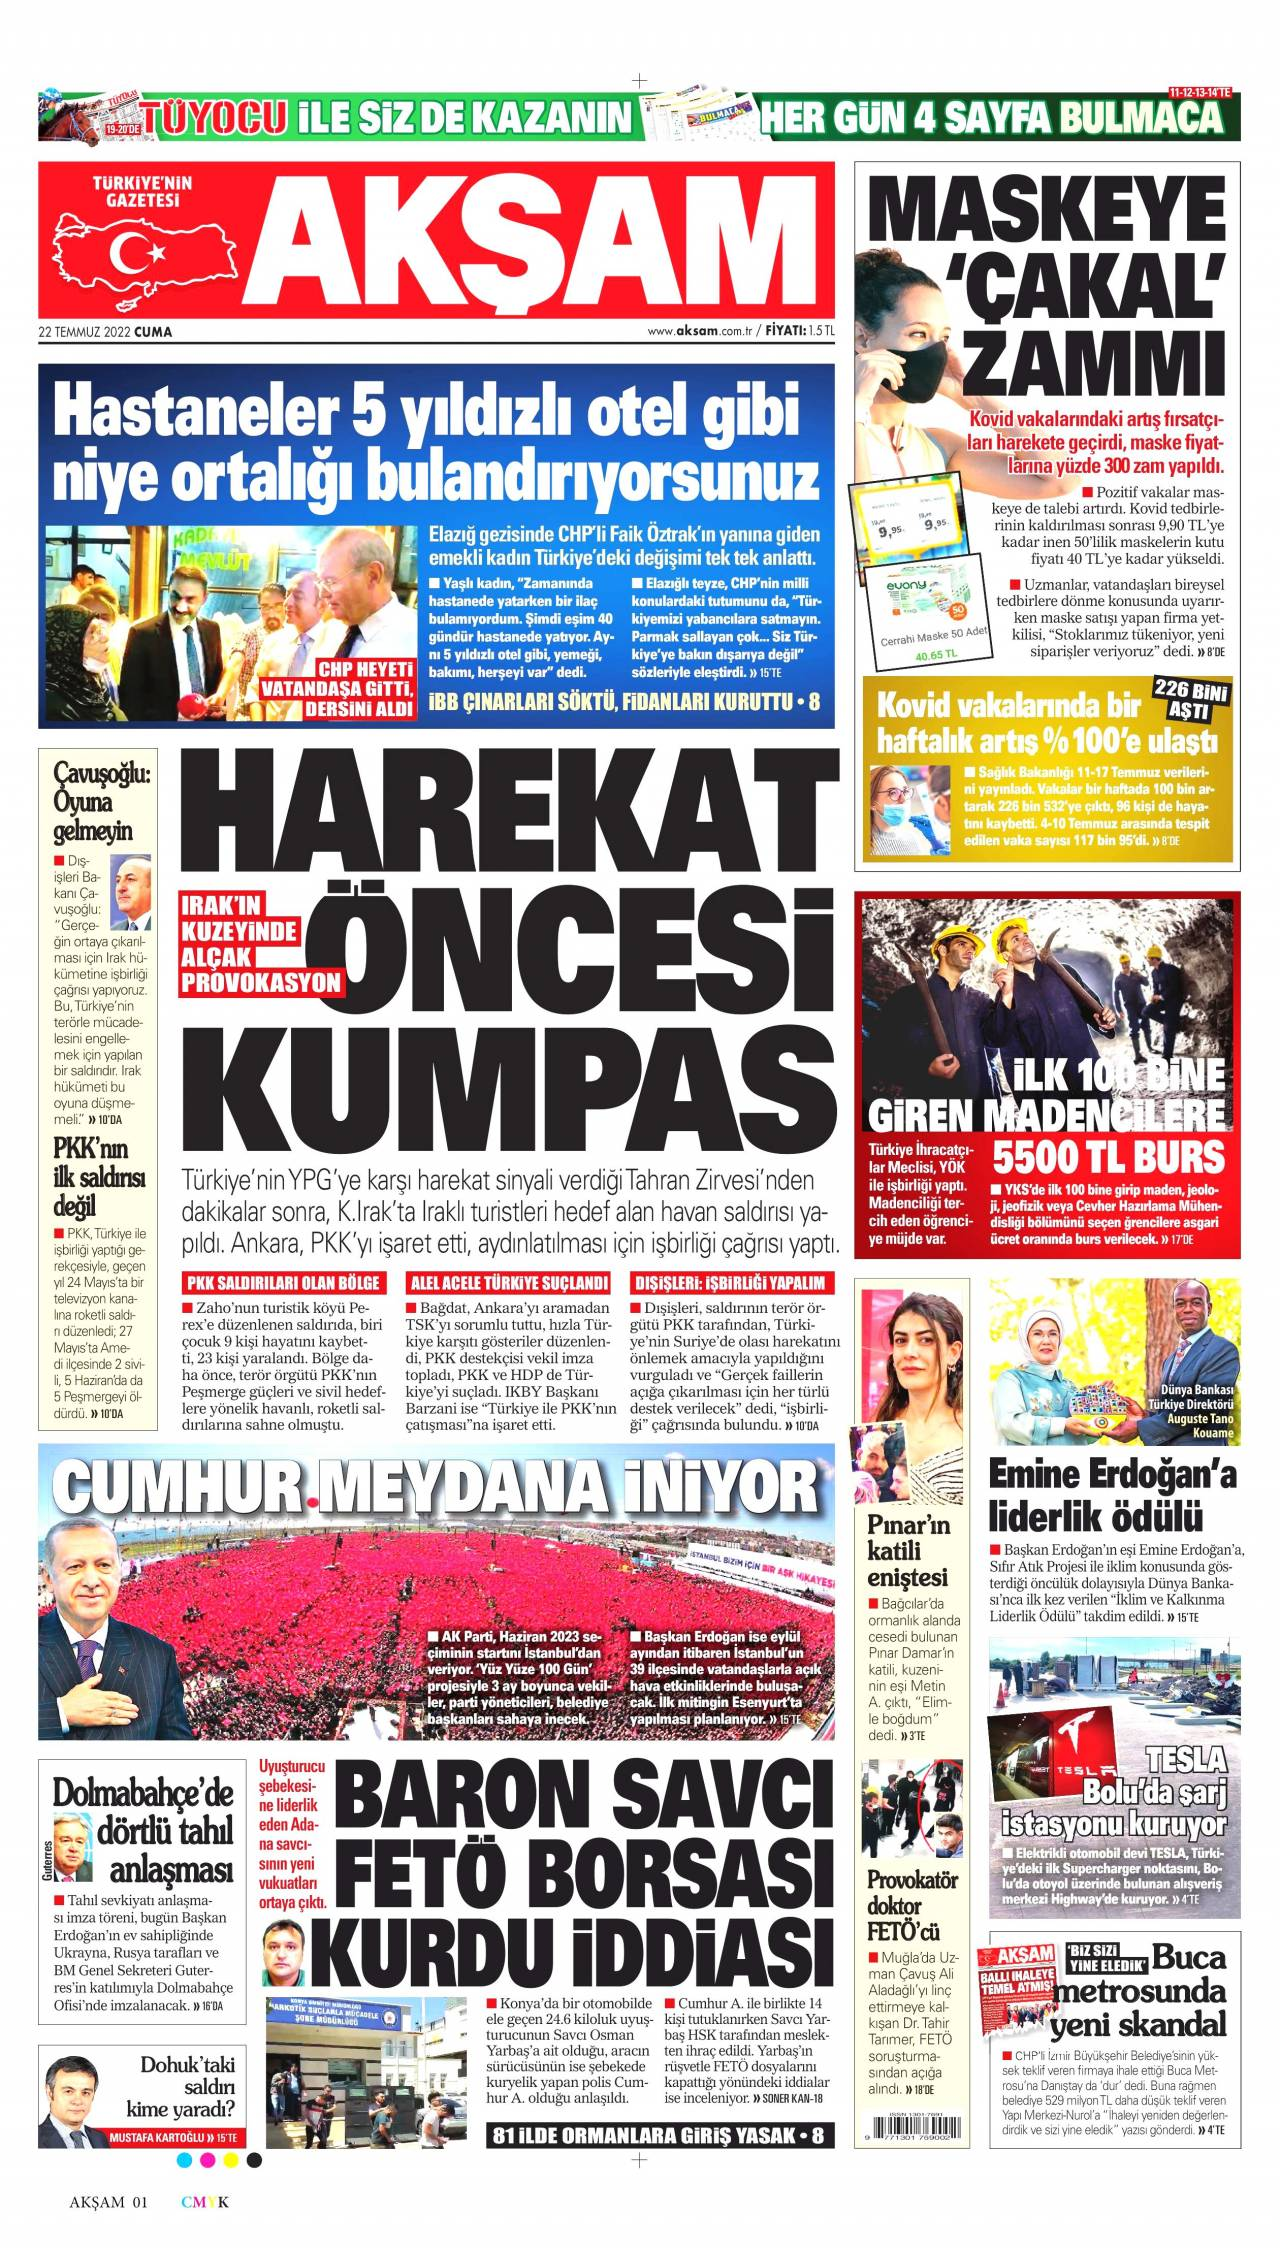 12 Ağustos 2020, Çarşamba aksam Gazetesi